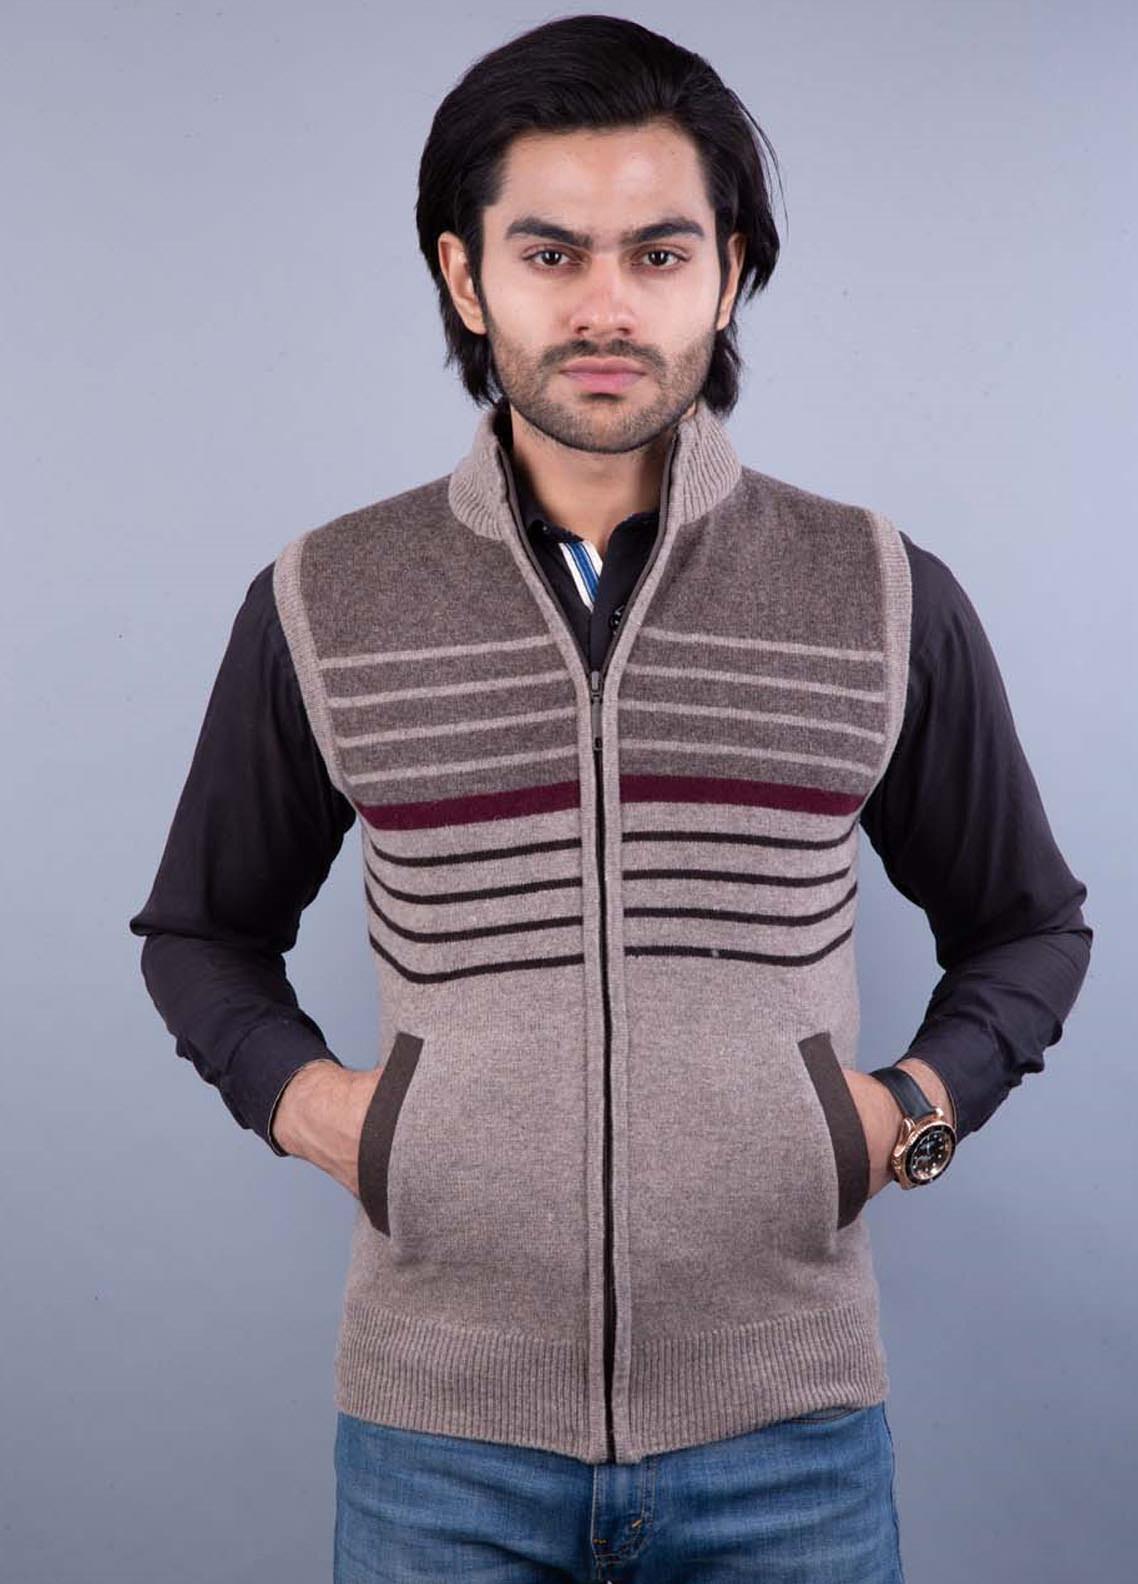 Oxford Lambswool Sleeveless Zipper Men Sweaters -  521 S-L ZIP L BROWN